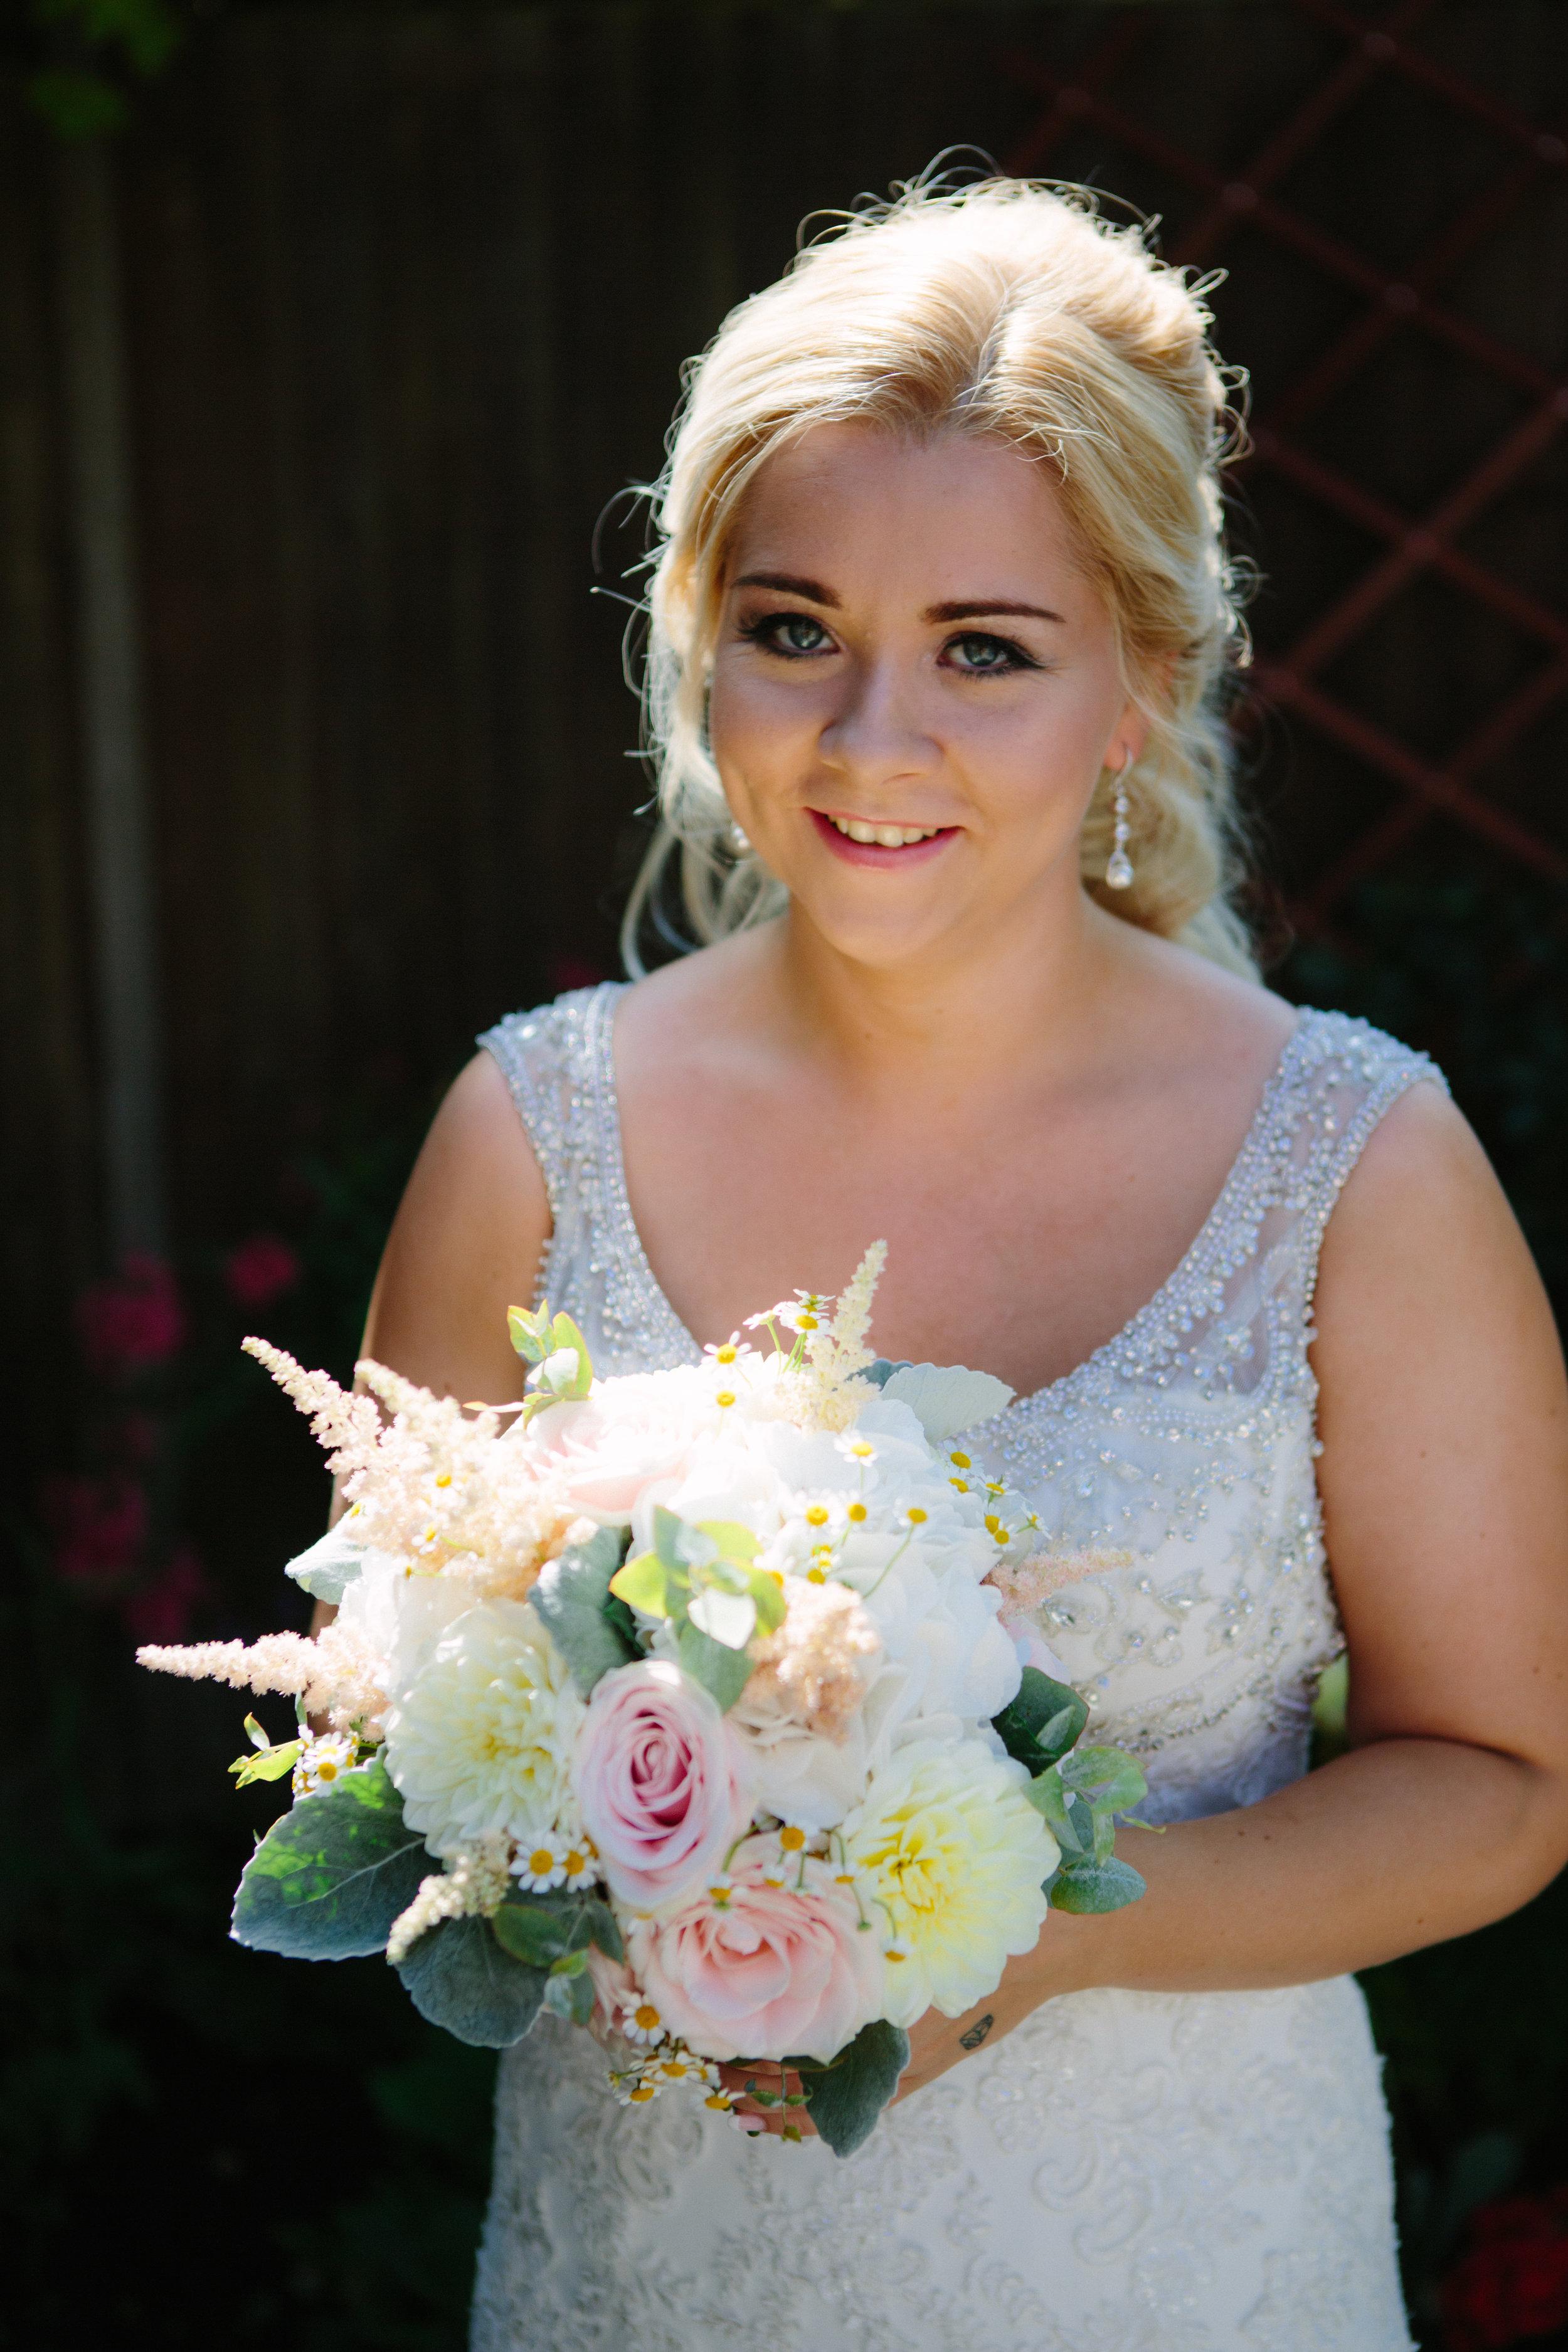 hertfordshire-hitchin-london-wedding-photography-St-bonaventures-catholic-church-bridal-prep-12